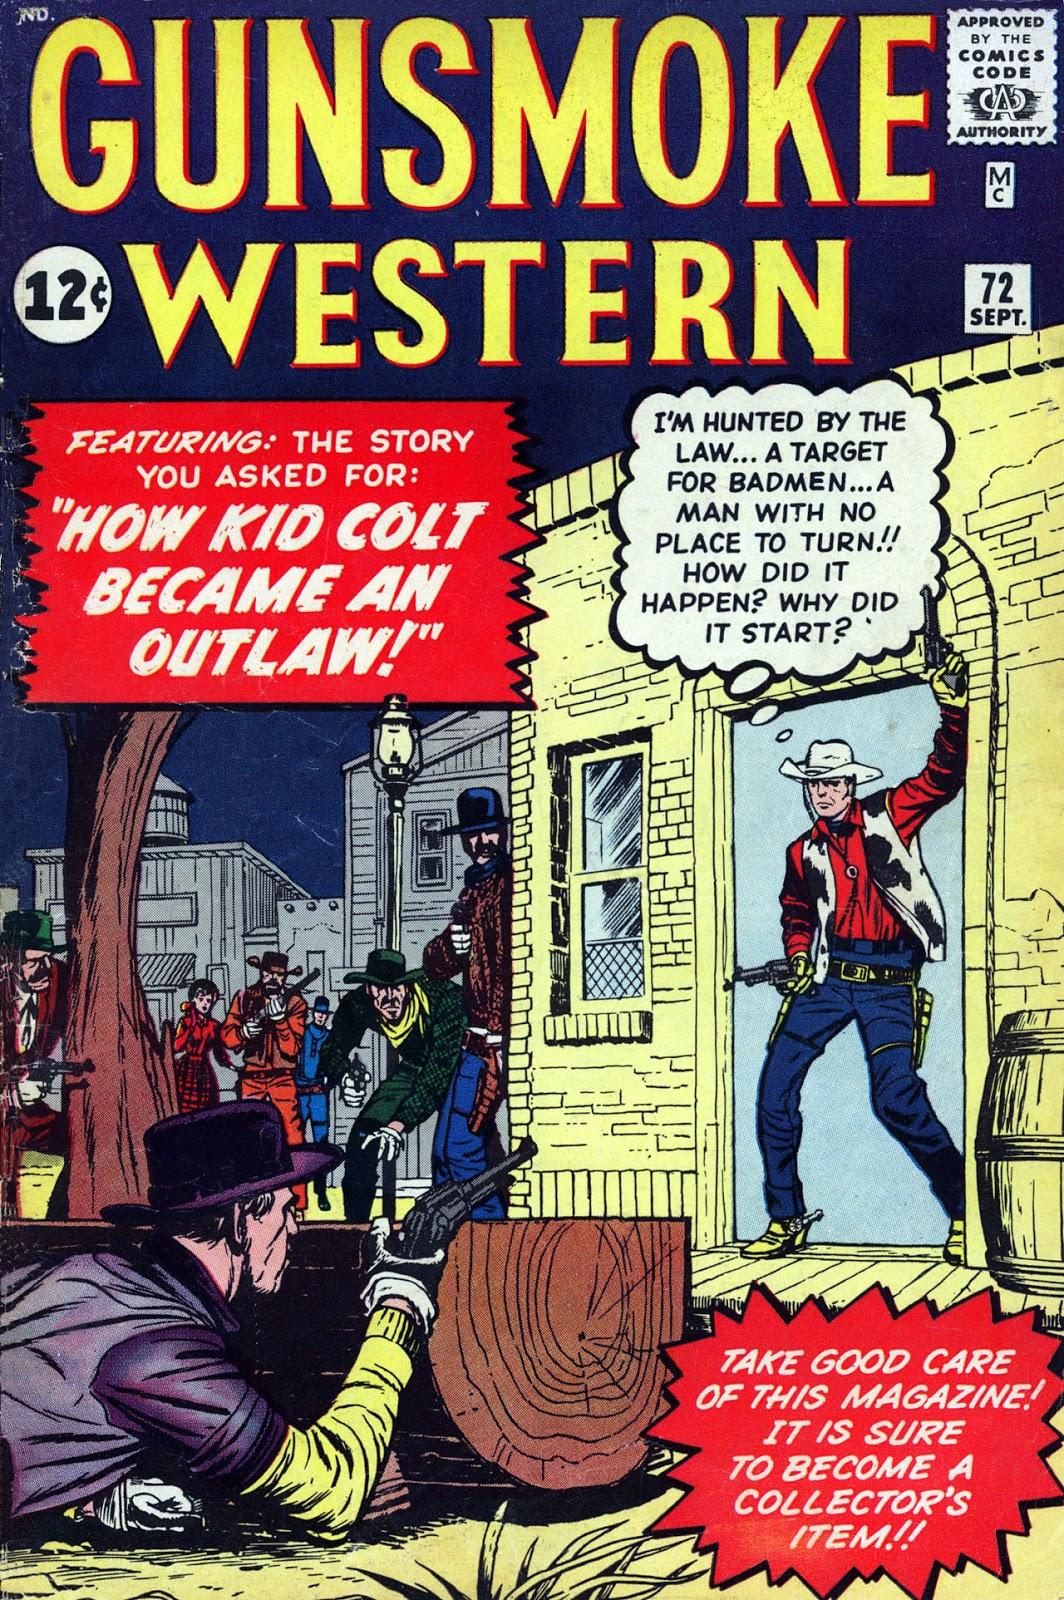 Gunsmoke Western issue 72 - Page 1